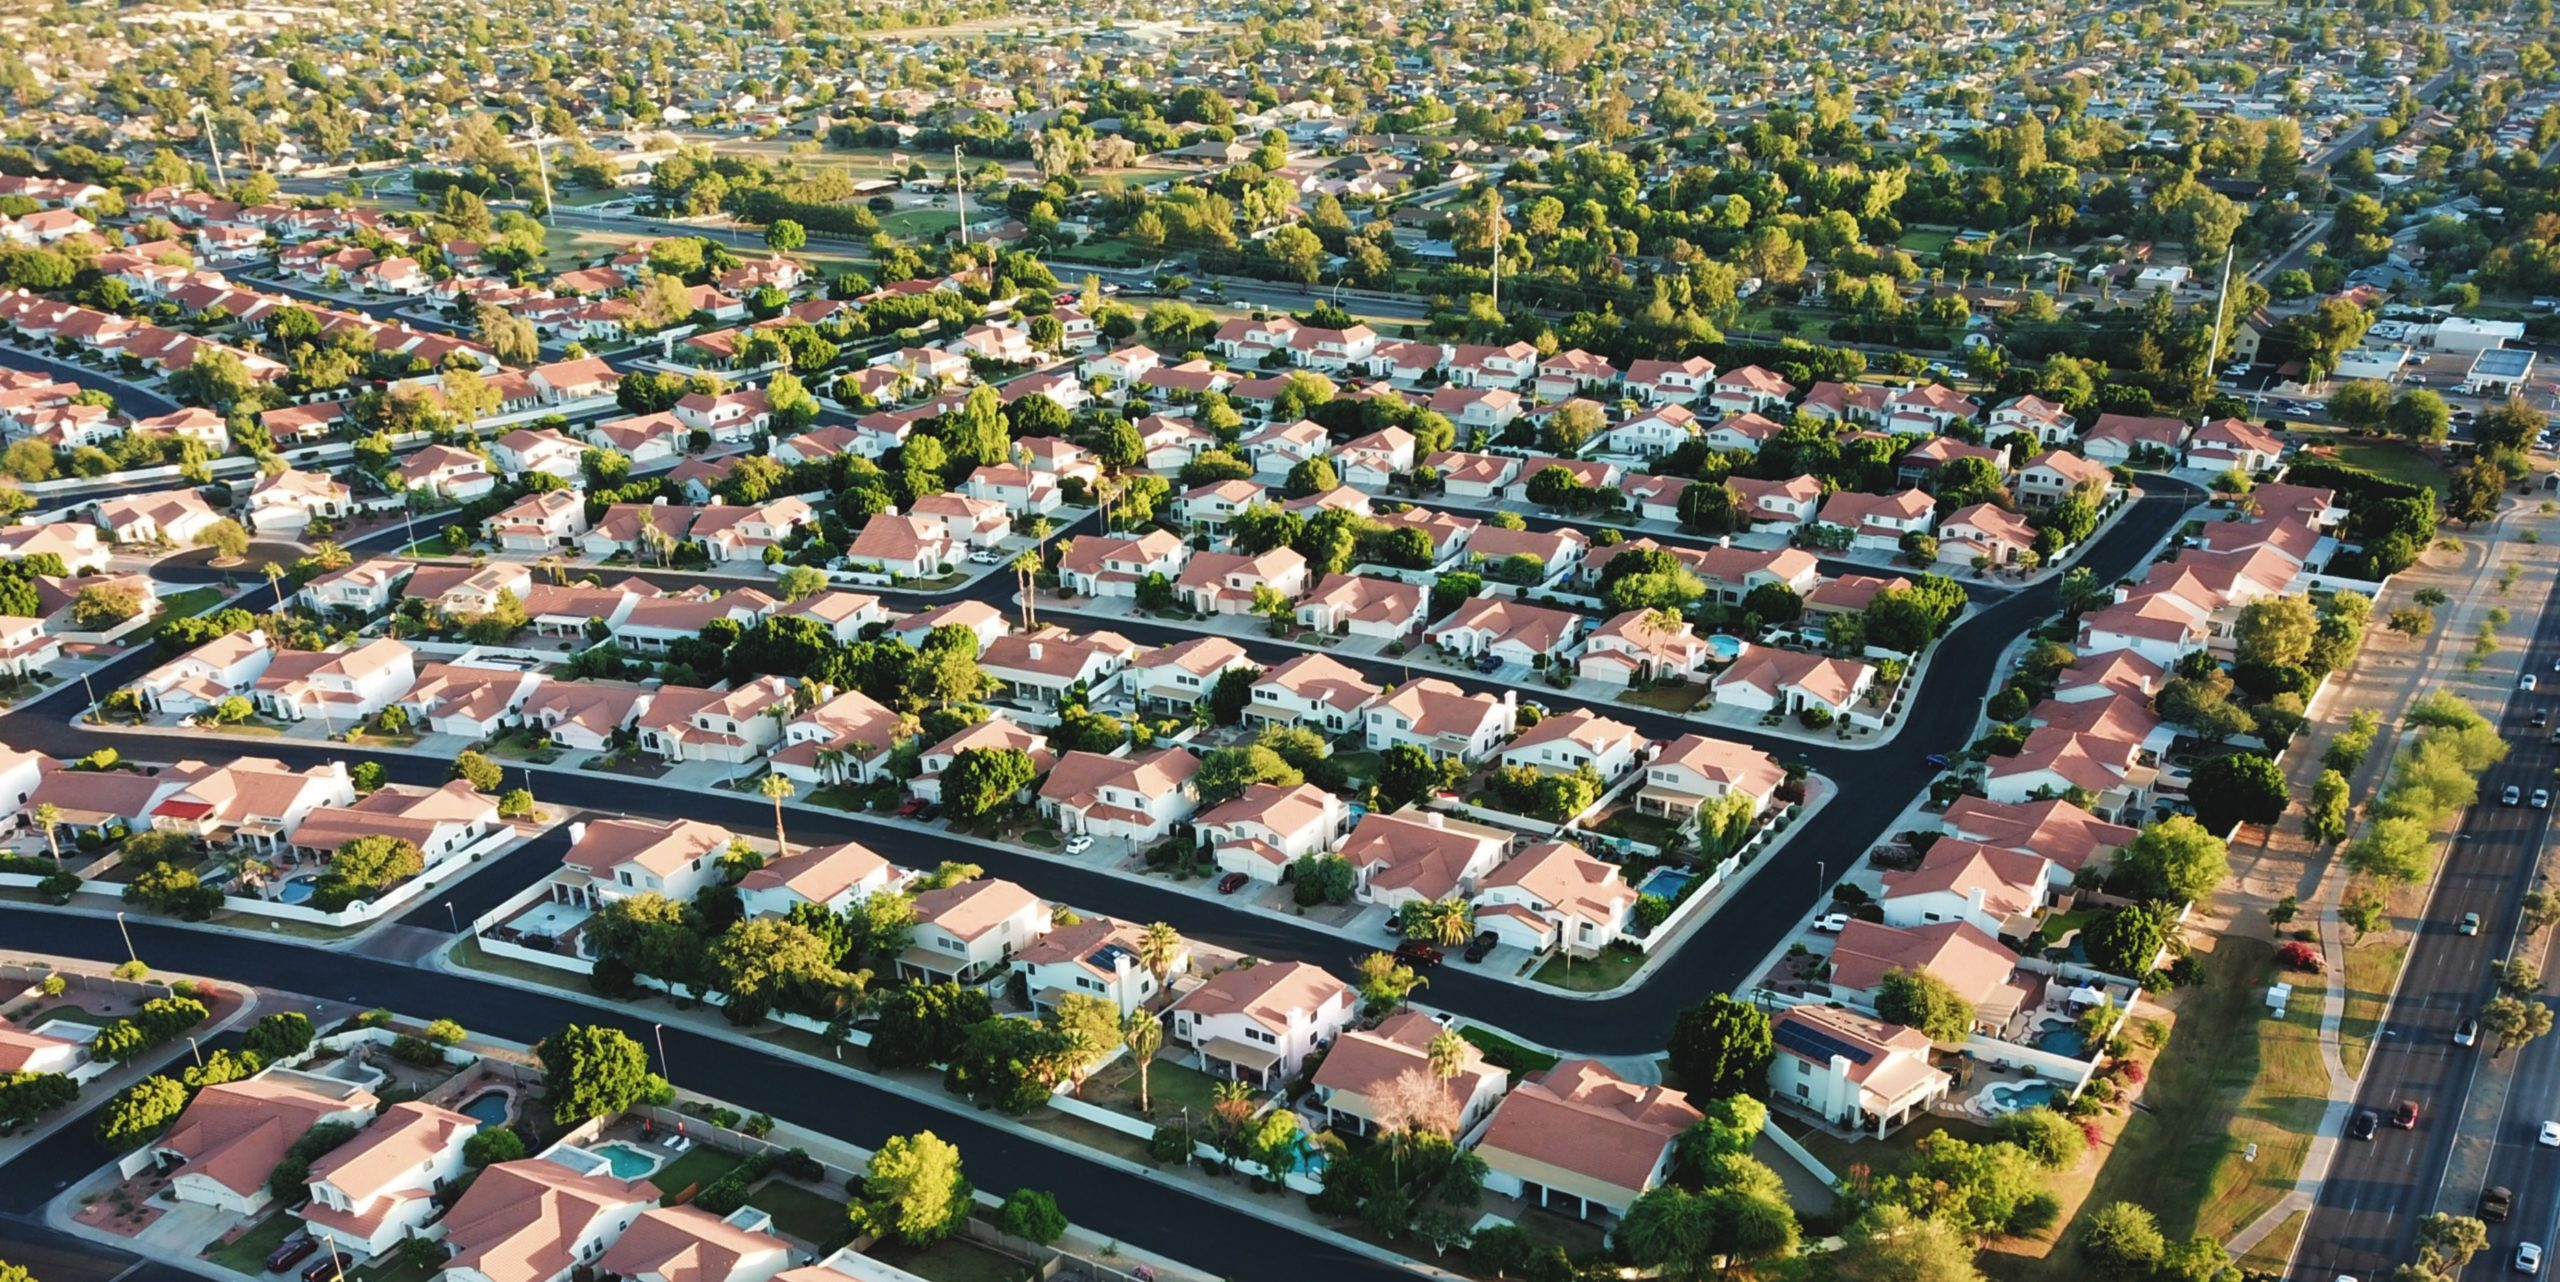 Aerial photo of a suburban neighborhood in Glendale, AZ